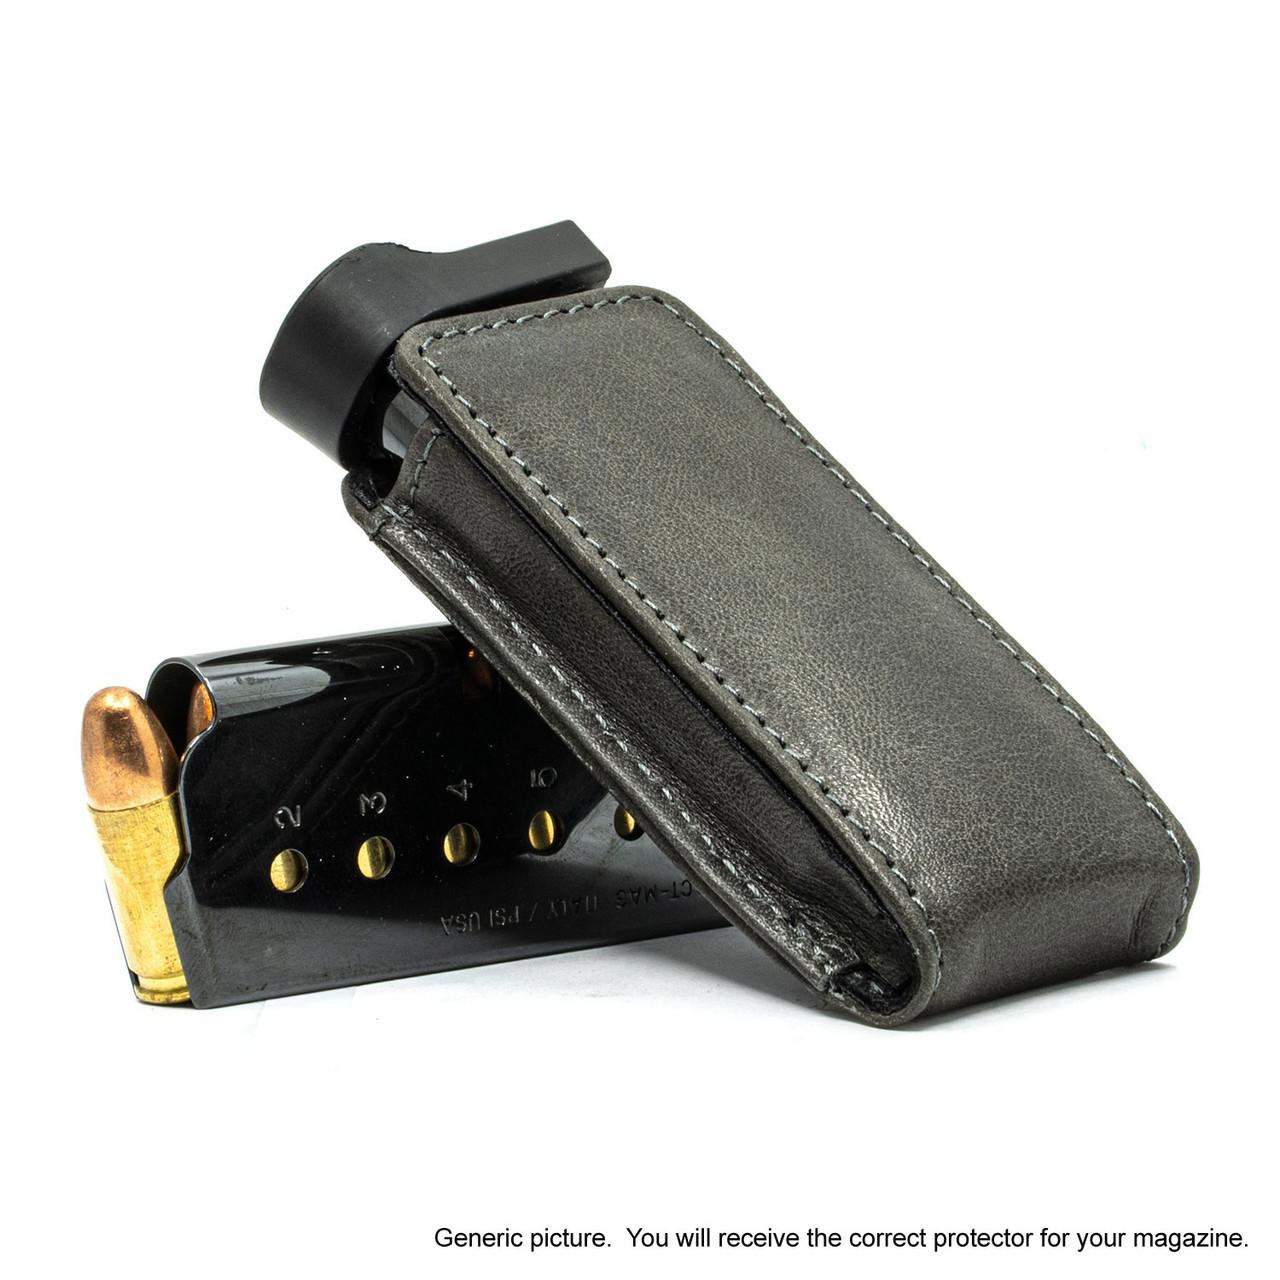 Colt Mark IV Series 80 (.380) Black Freedom Magazine Pocket Protector